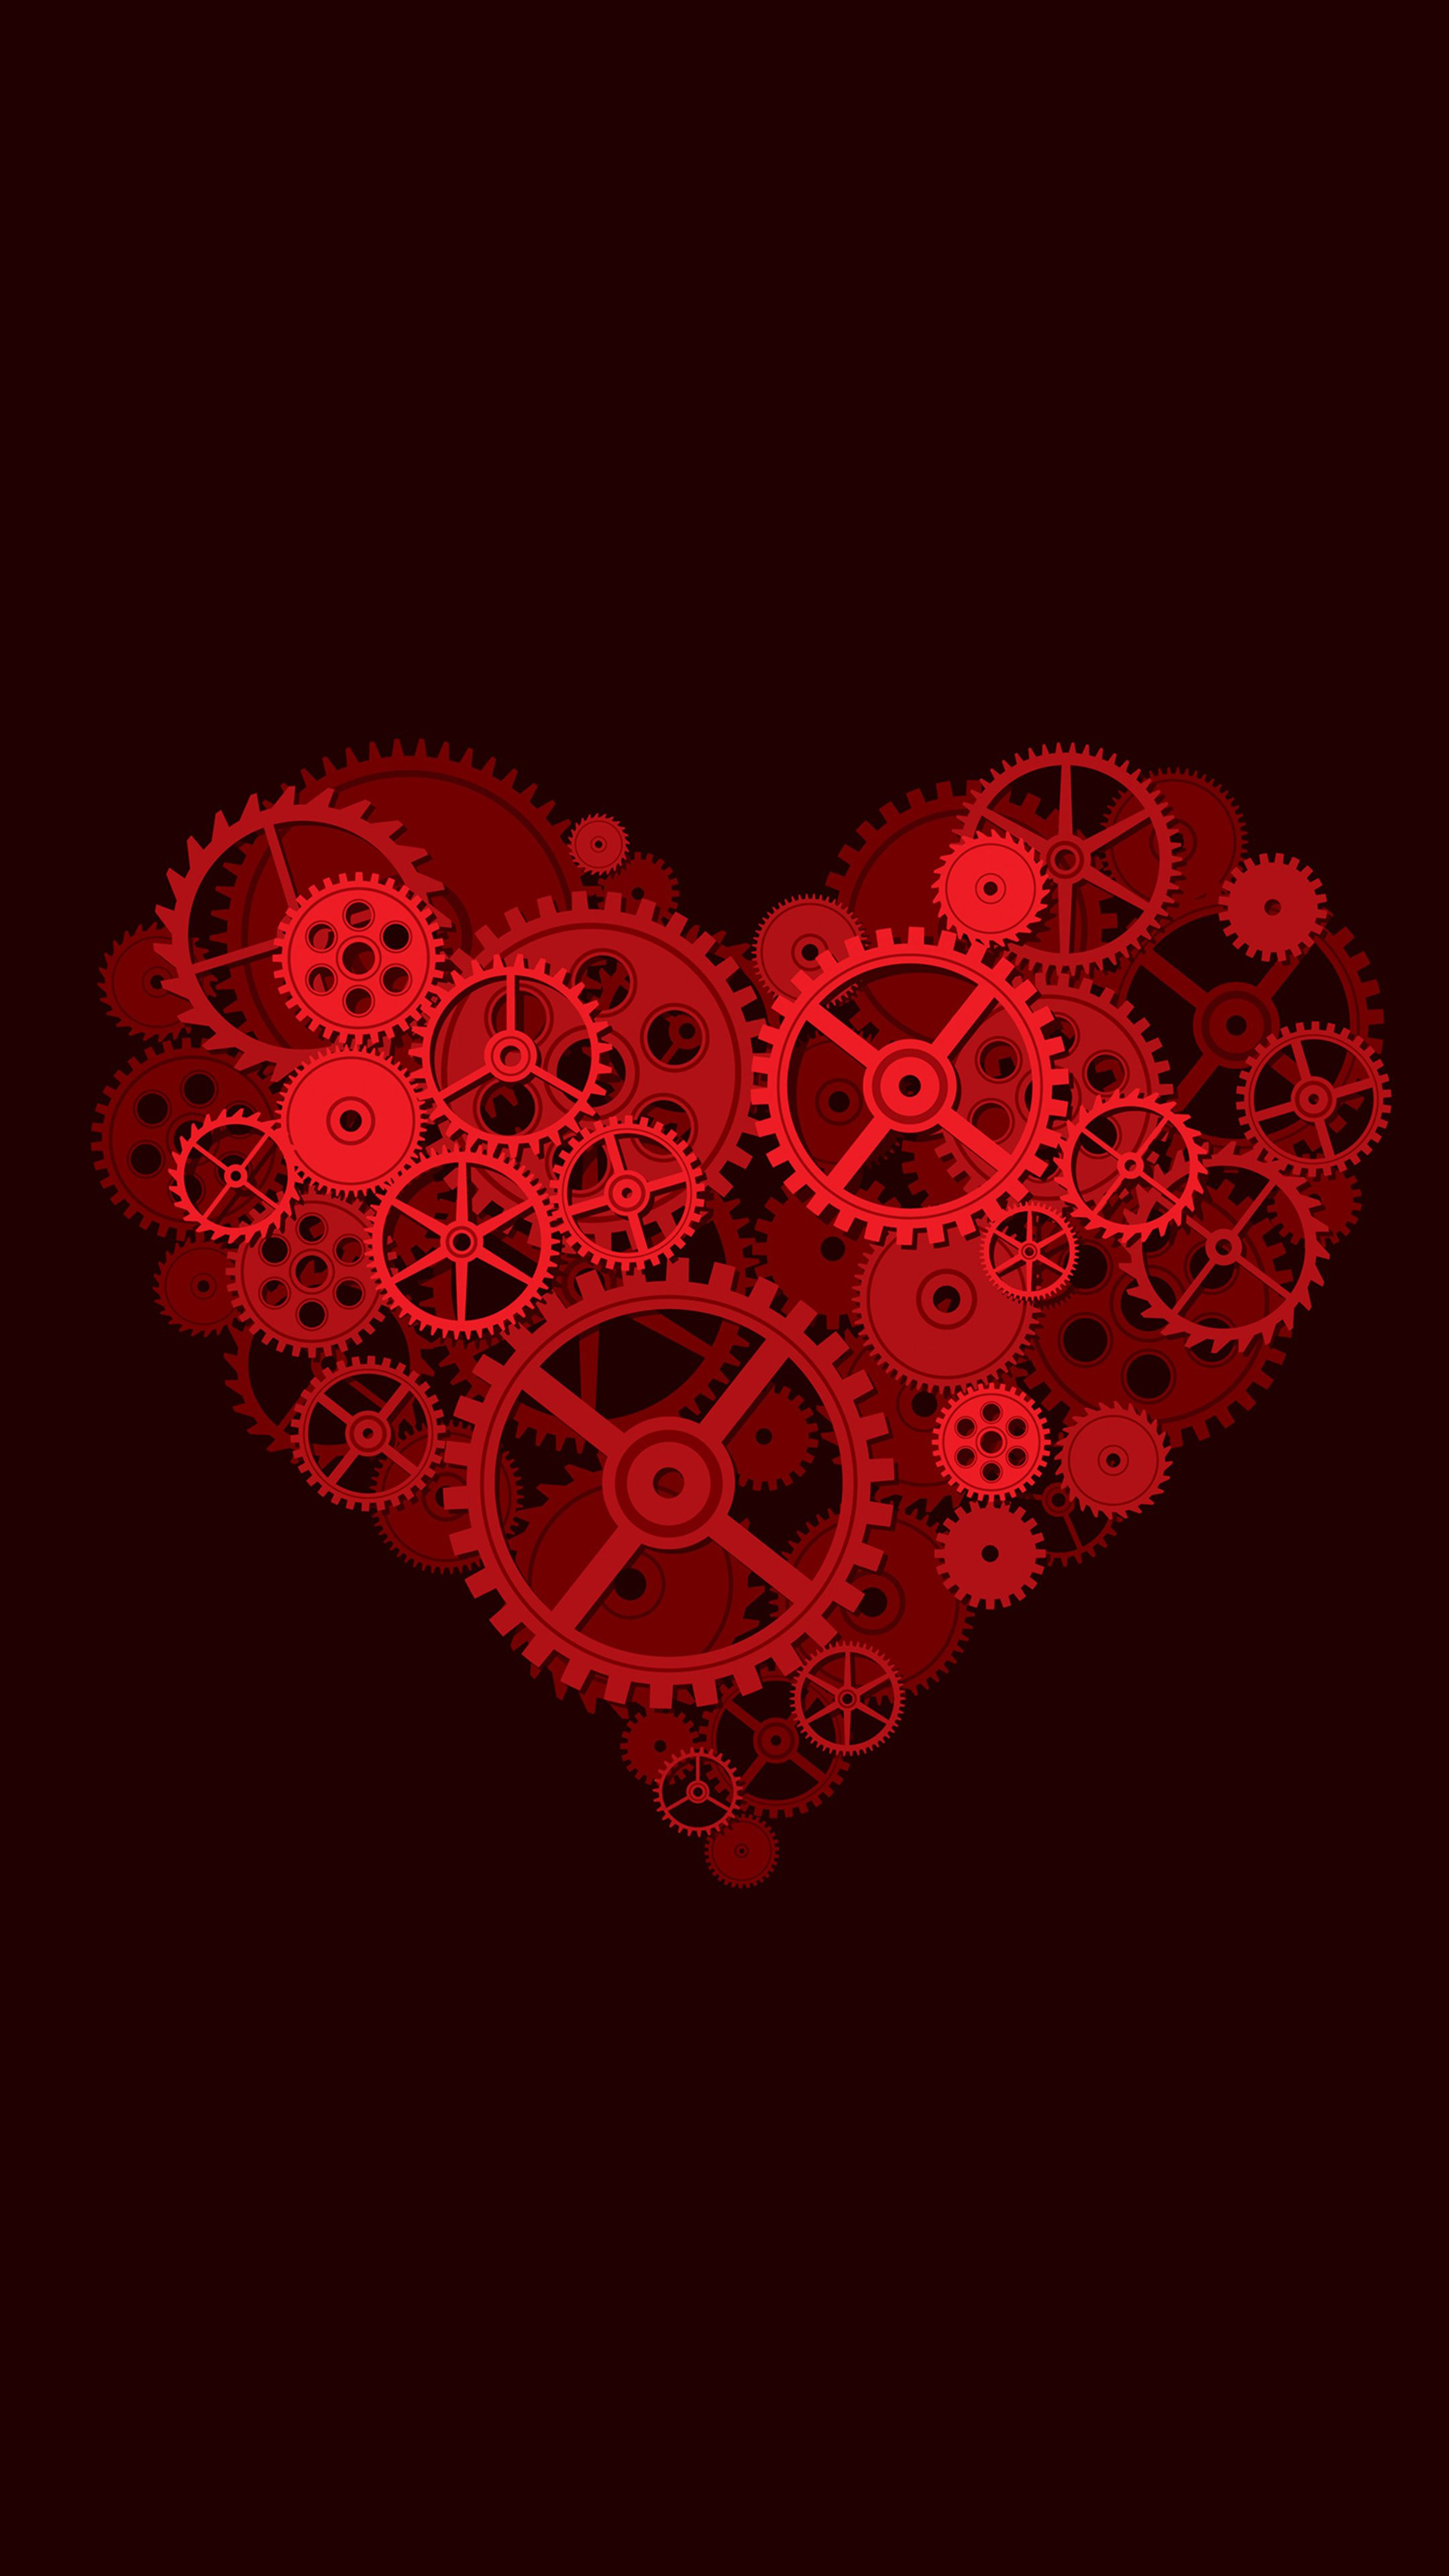 Emotions Heart Digital Art 4k wallpapers Love